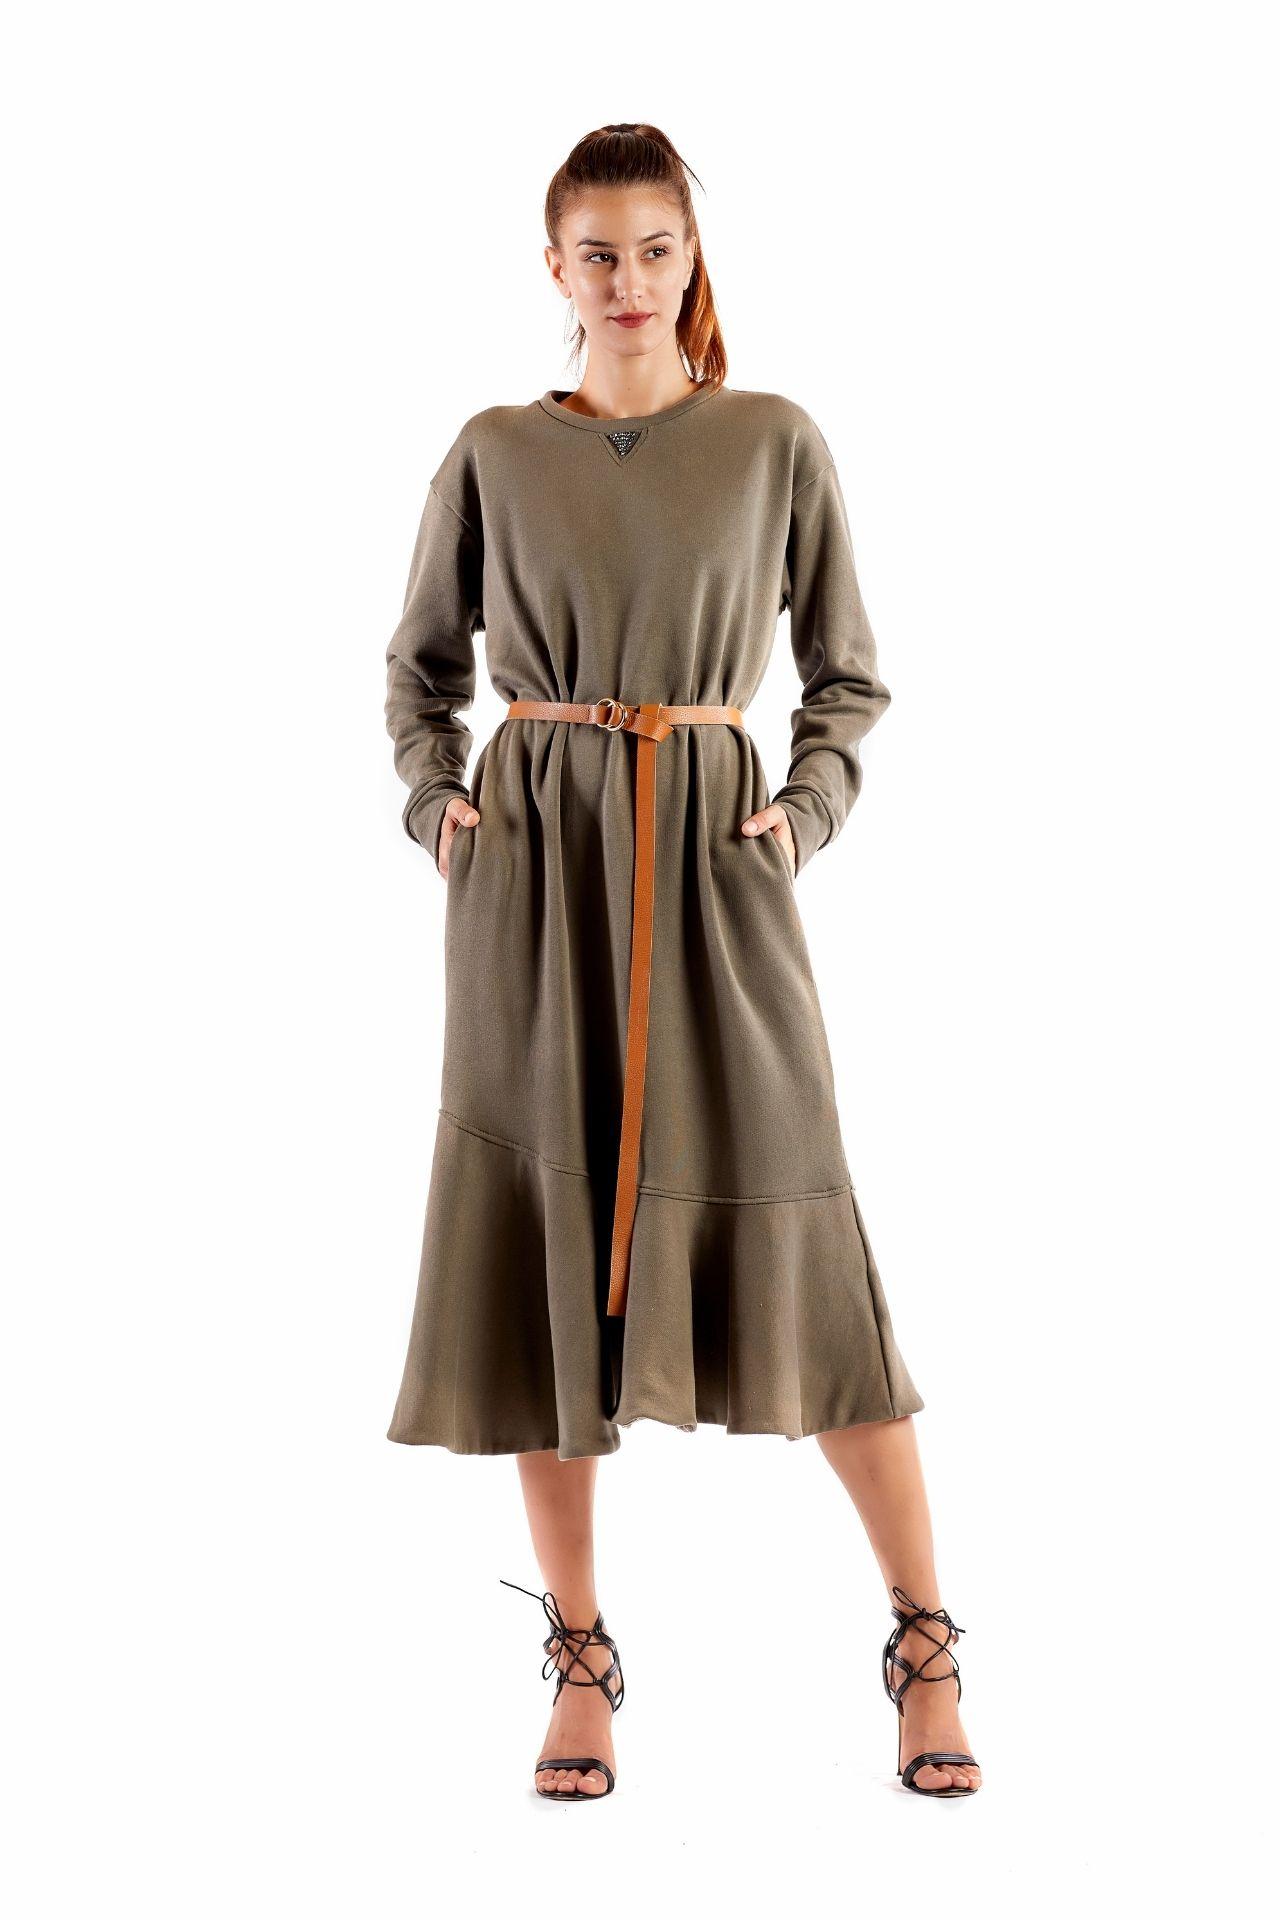 Rossella green fleece dress and belt